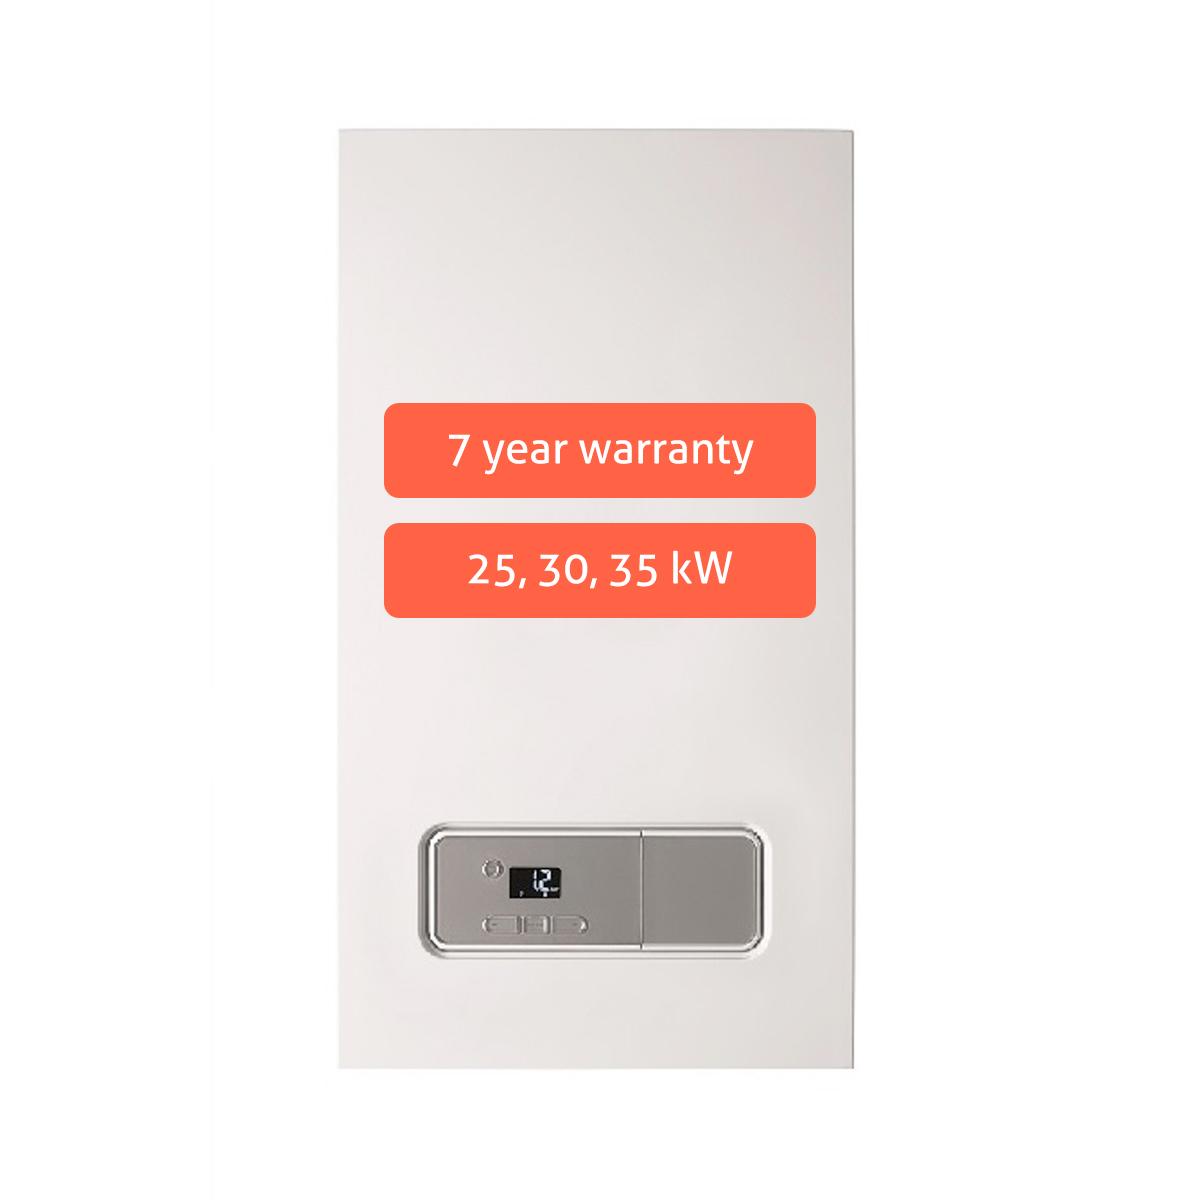 Glowworm Boiler Installation - Fityourboiler.co.uk